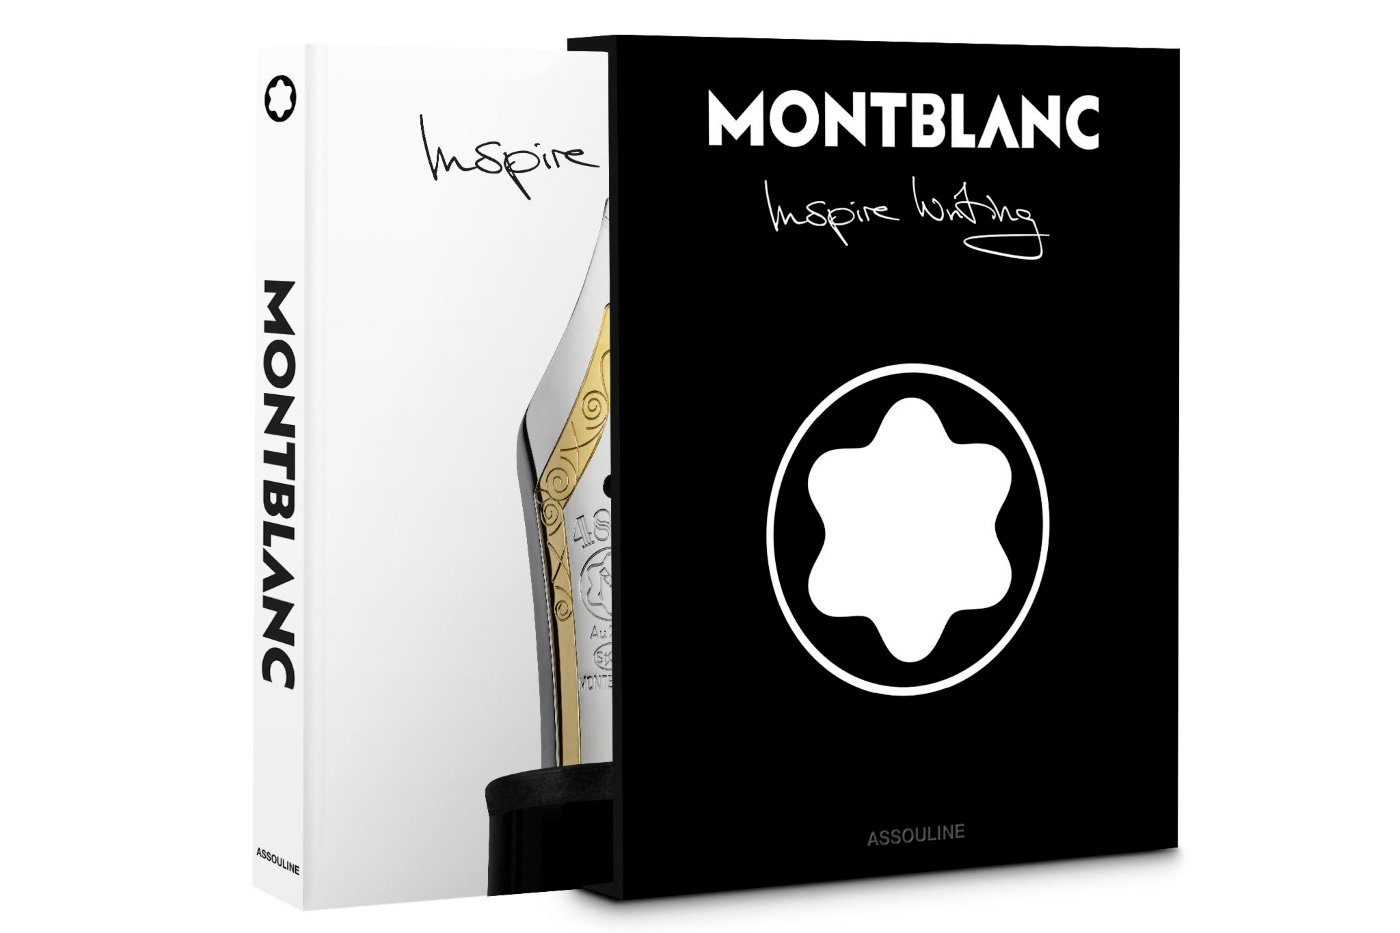 Montblanc_inspire_writing_slipcase_-_europa_star_magazine_2021